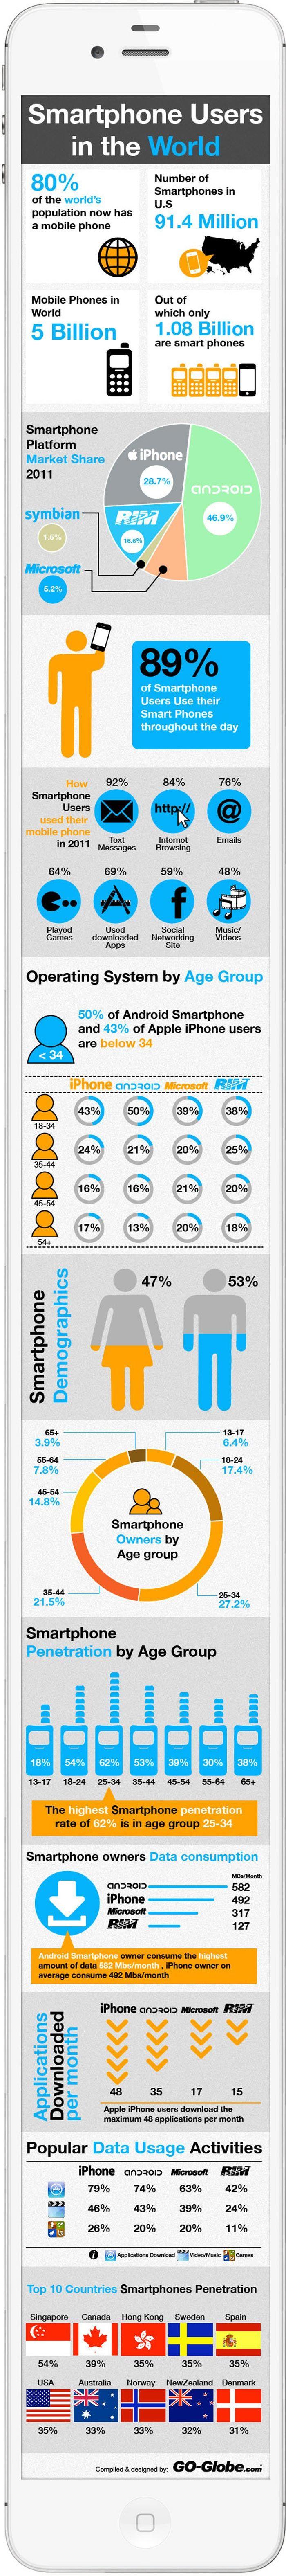 Smartphone Usage Statistics 2012 [Infographic]